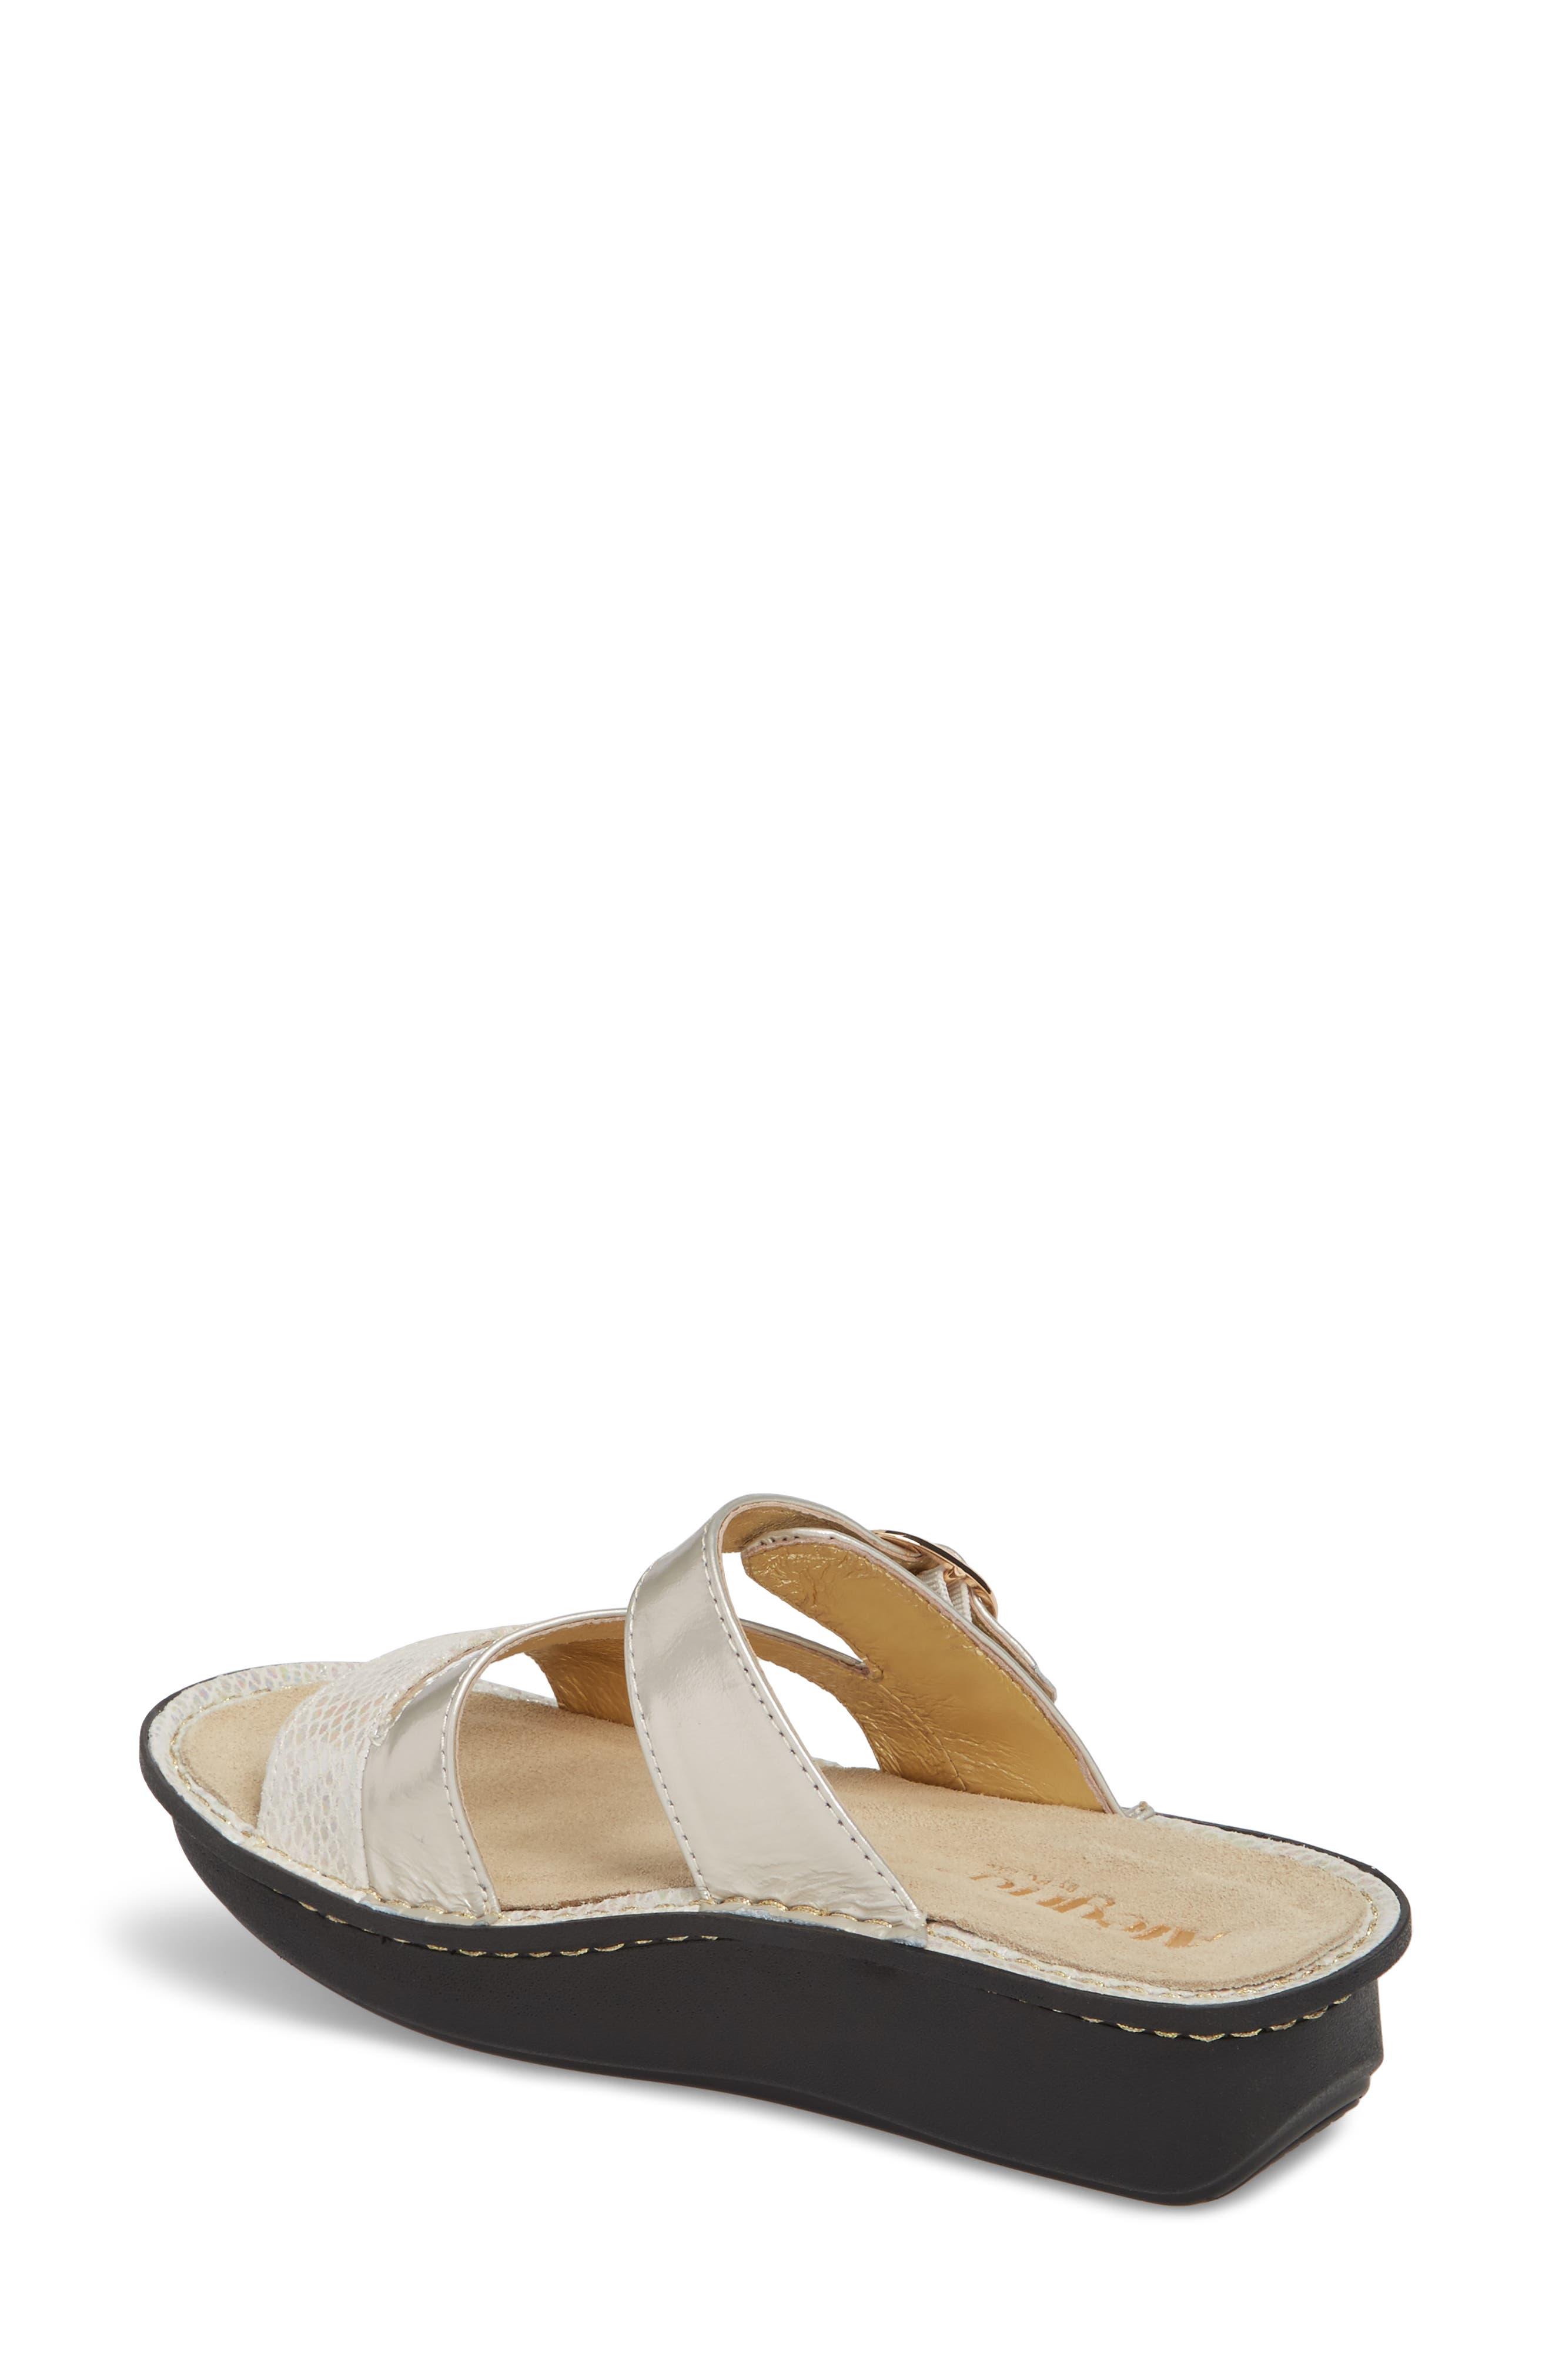 'Colette' Platform Sandal,                             Alternate thumbnail 2, color,                             Opfully Leather